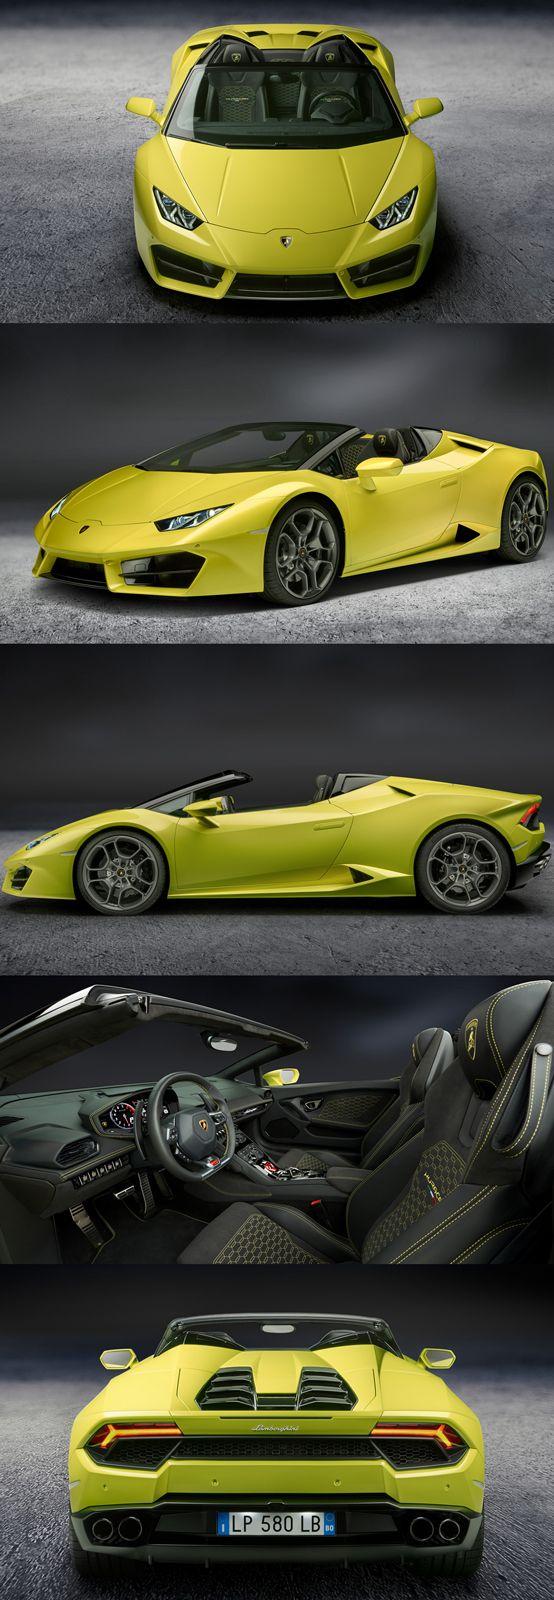 New Lamborghini Huracán RWD Spyder